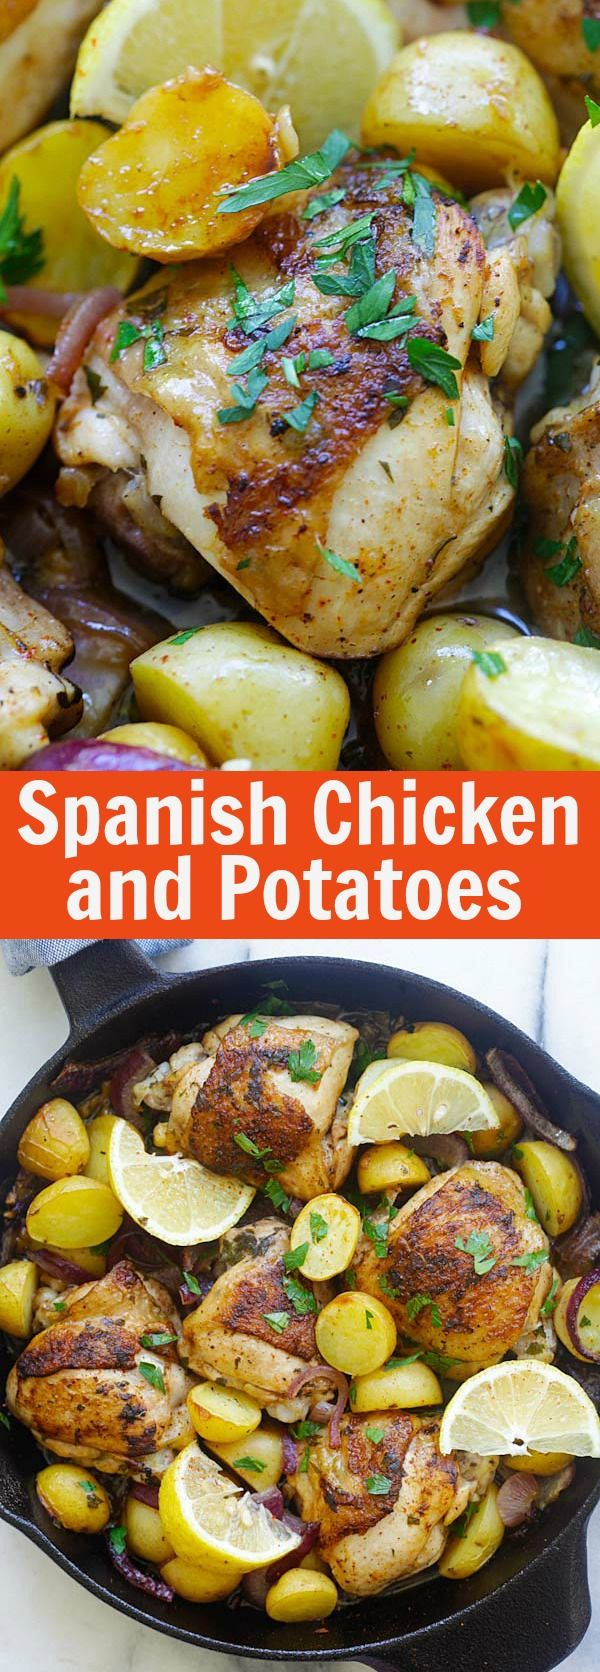 Spanish Chicken and Potatoes - Crazy delicious one-pot Spanish chicken and potatoes bake with onions, garlic, and paprika. So good | rasamalaysia.com